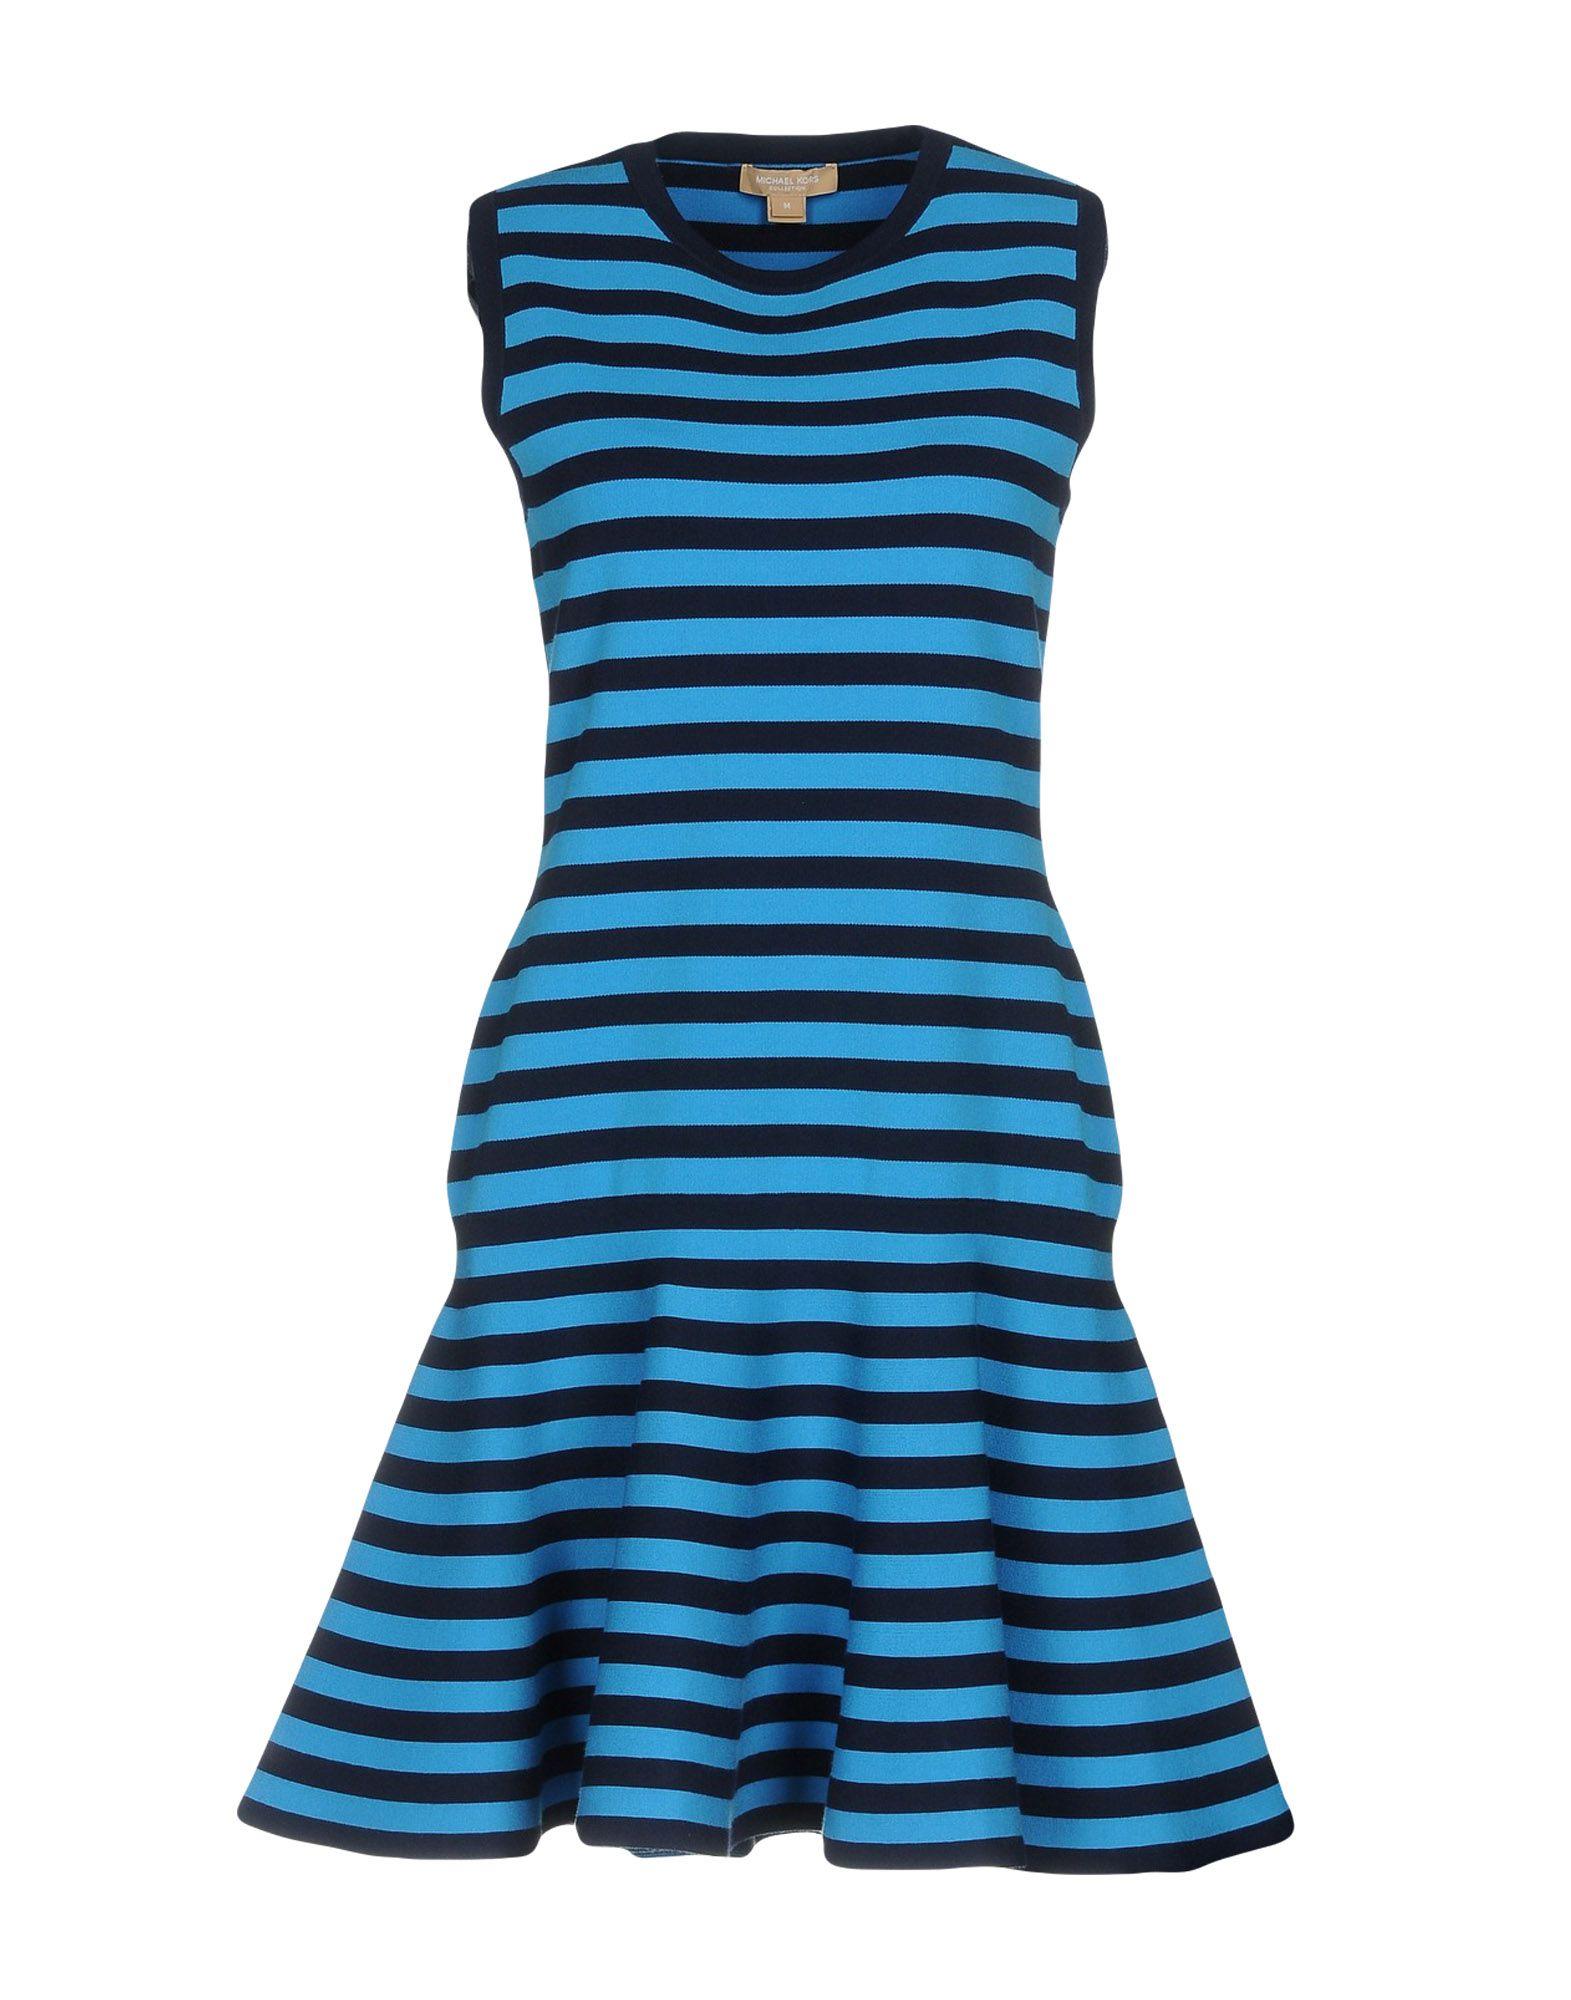 ФОТО michael kors collection короткое платье